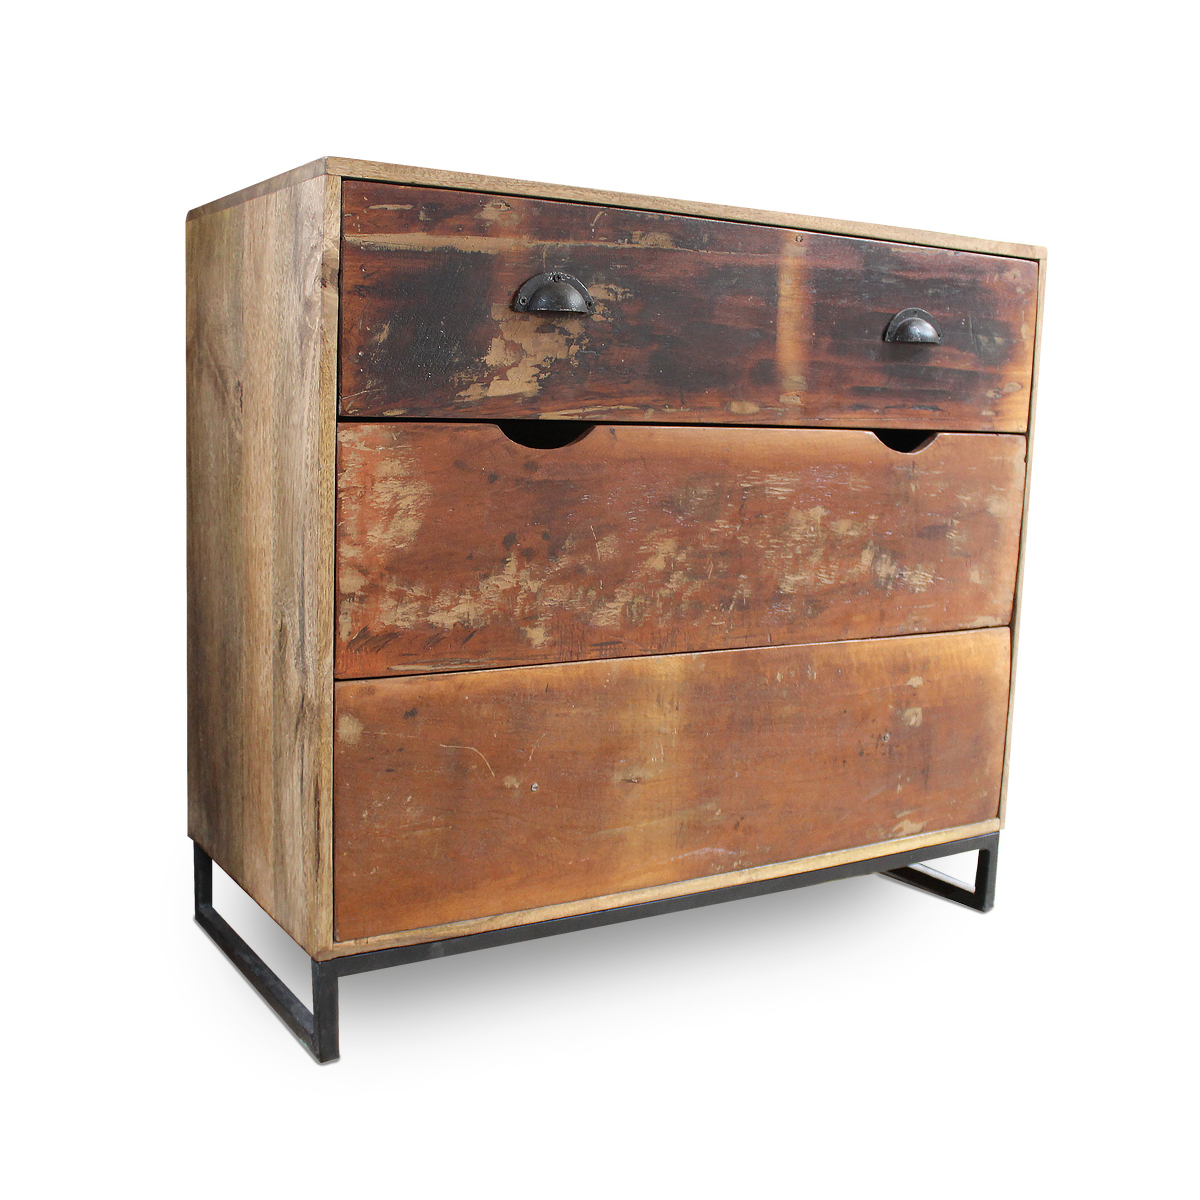 kommode aus sheeshamholz massivholz shabby chic kommoden industrial shabby moebeldeal. Black Bedroom Furniture Sets. Home Design Ideas